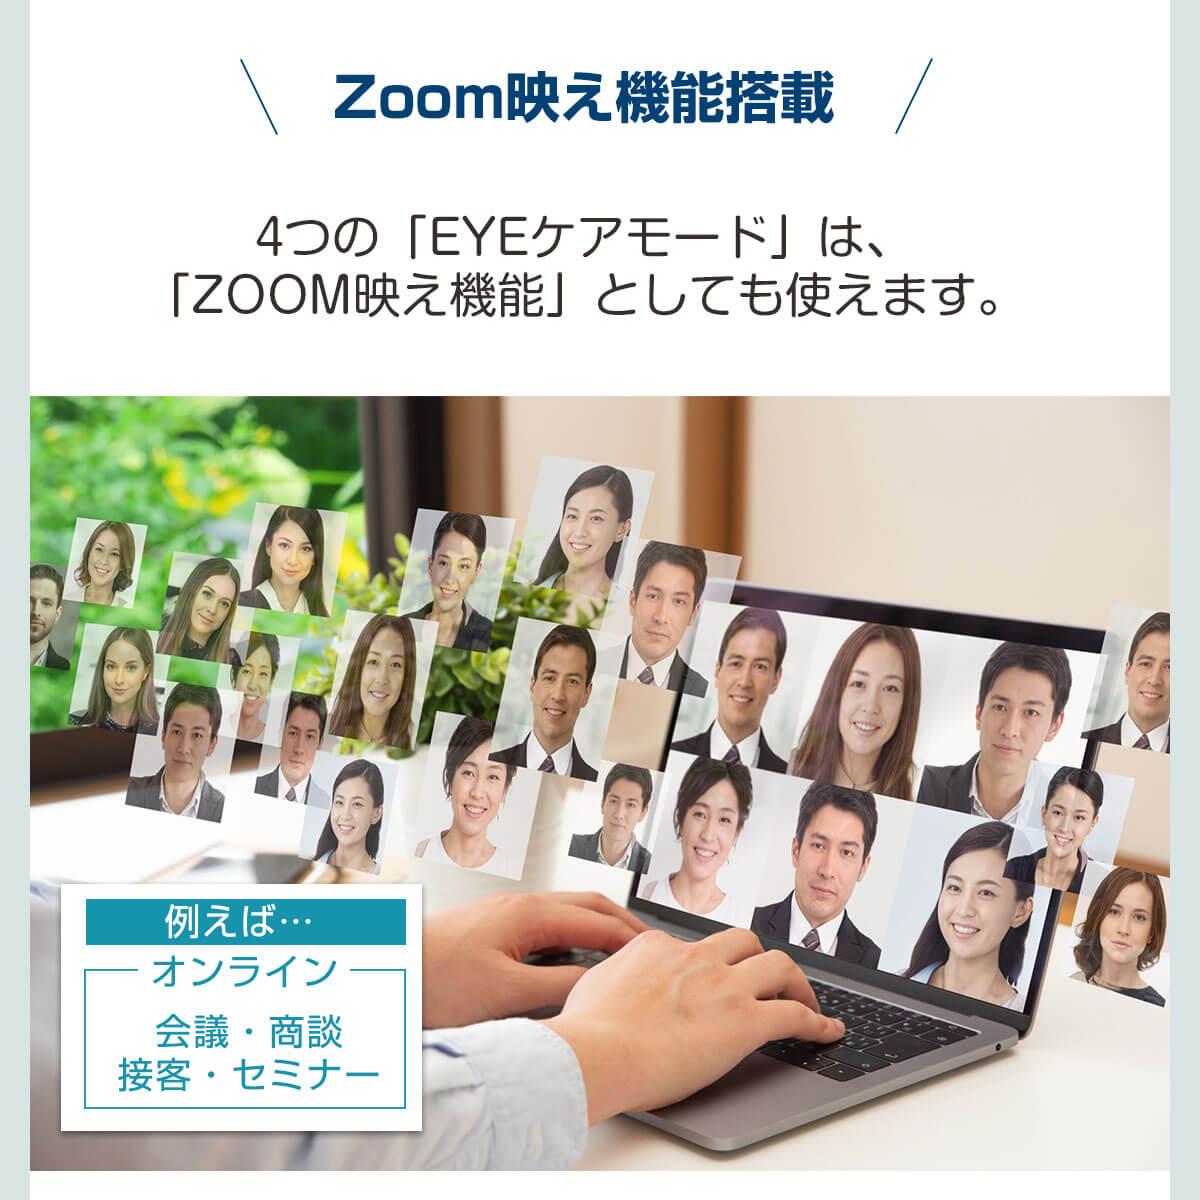 Zoom映え機能搭載